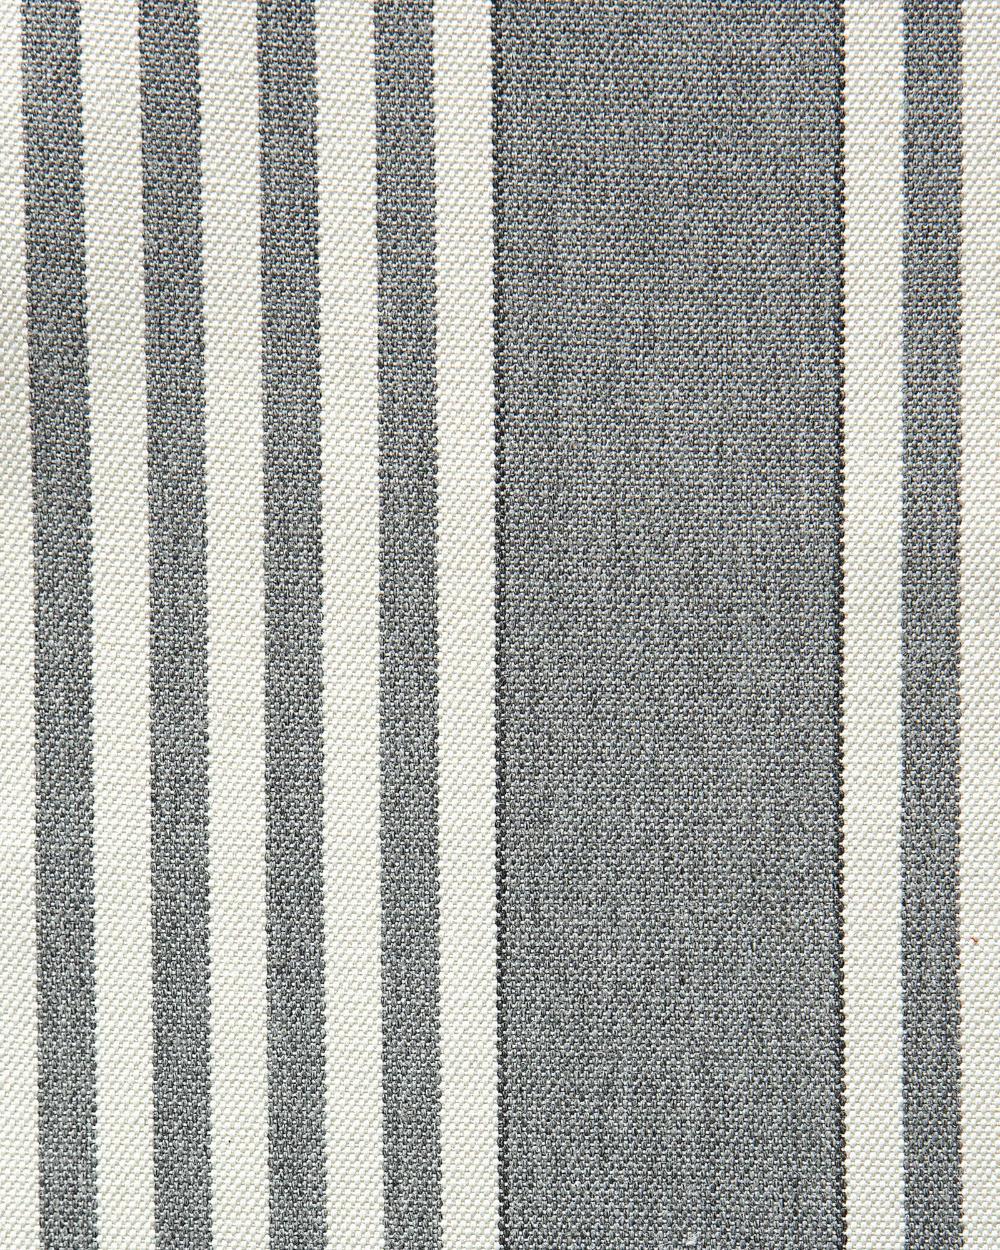 Fabric By The Yard Perennials Cabana Stripe Fabric En 2020